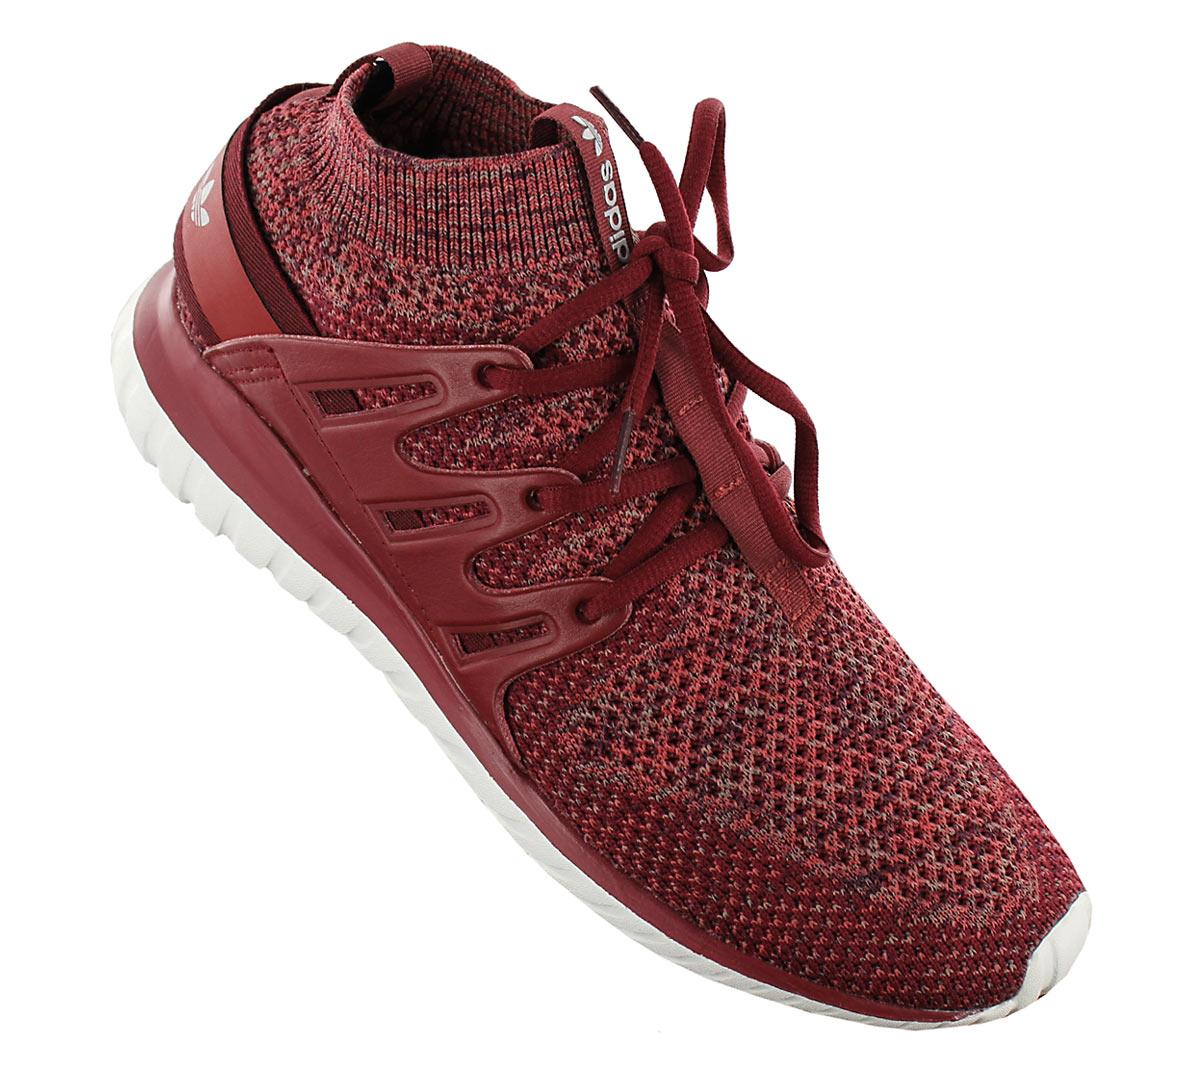 Details about Adidas Originals Tubular Nova Pk Primeknit Textile Shoes Sneaker Red BB8406 New